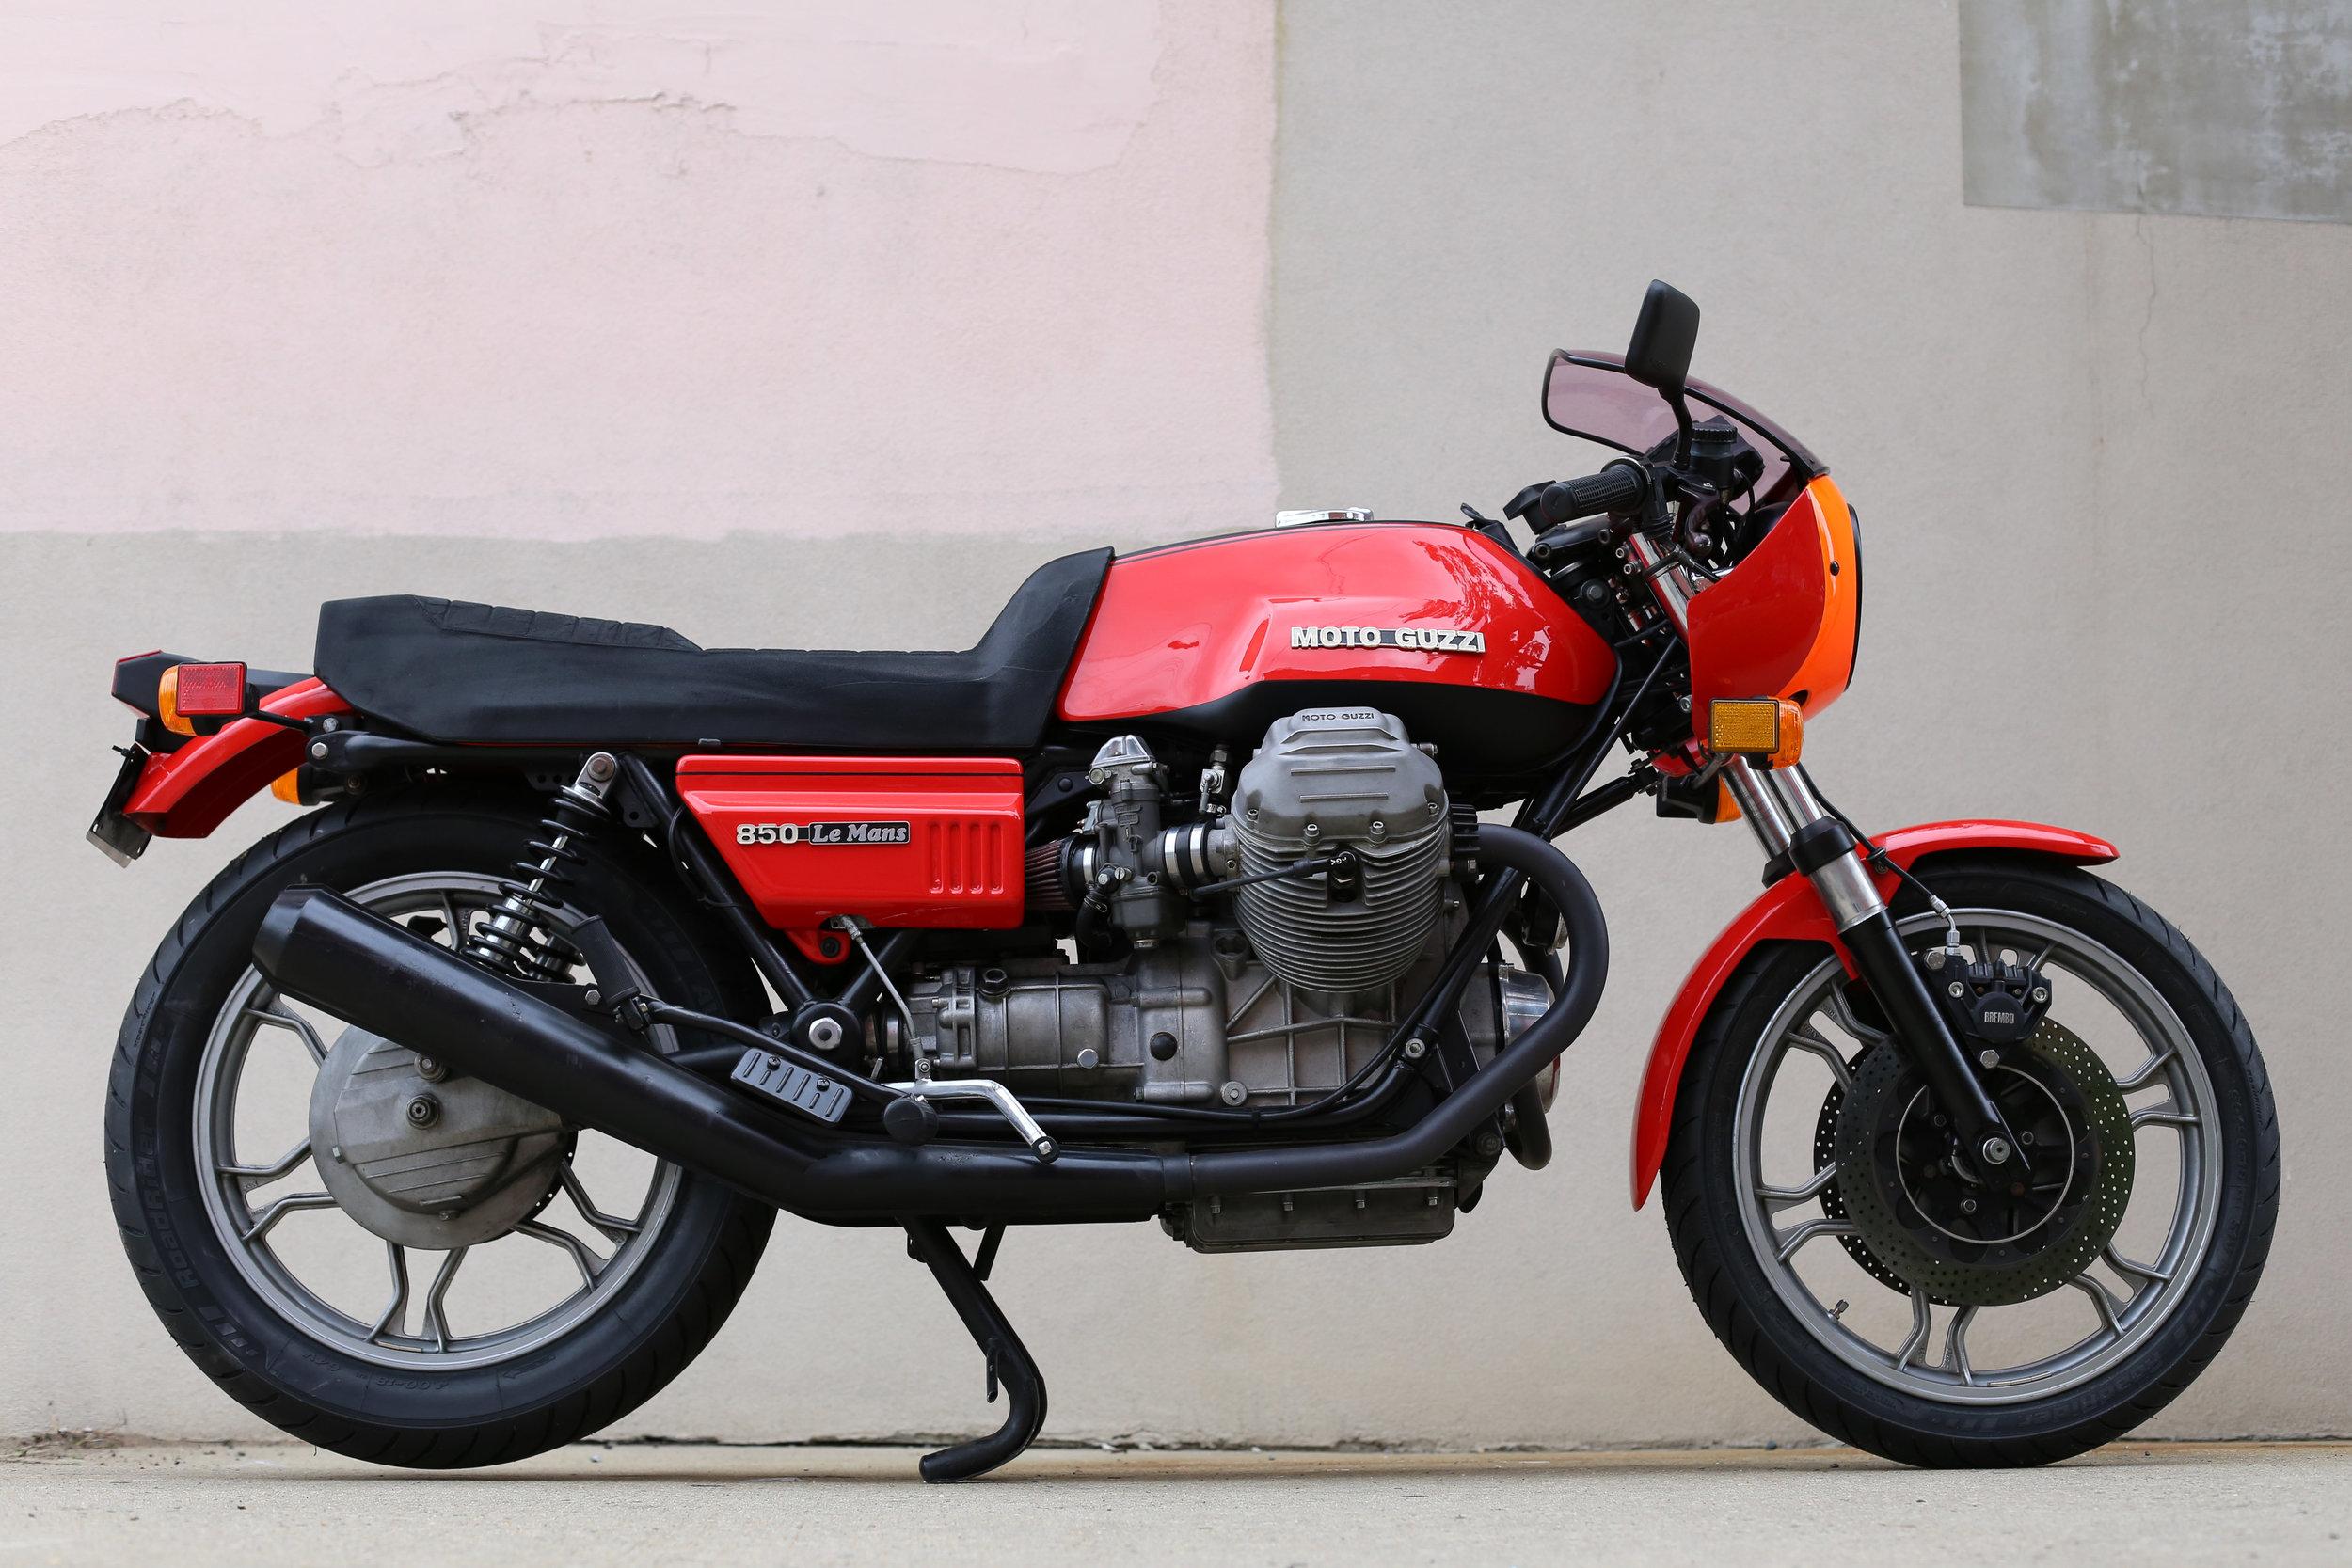 1977 Moto Guzzi Le Mans 1 Sold Motorcycles